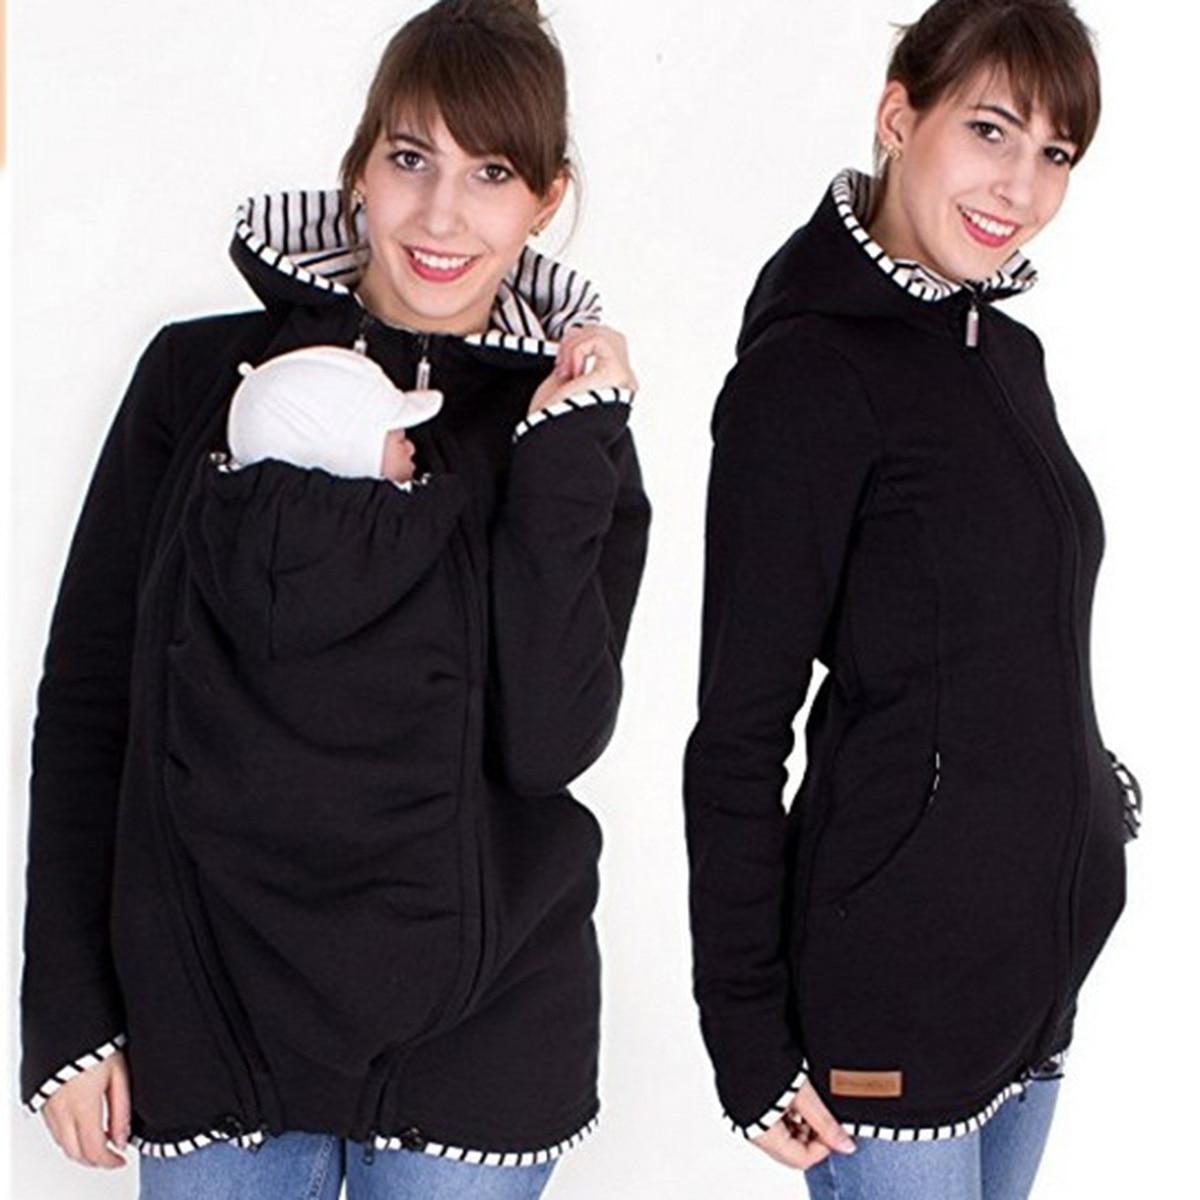 Long Sleeve Maternity Warm Cotton Clothing Mother Autumn Winter Women Hoddies Carry Baby Holder Infant Sweatshirt Jacket Carrier